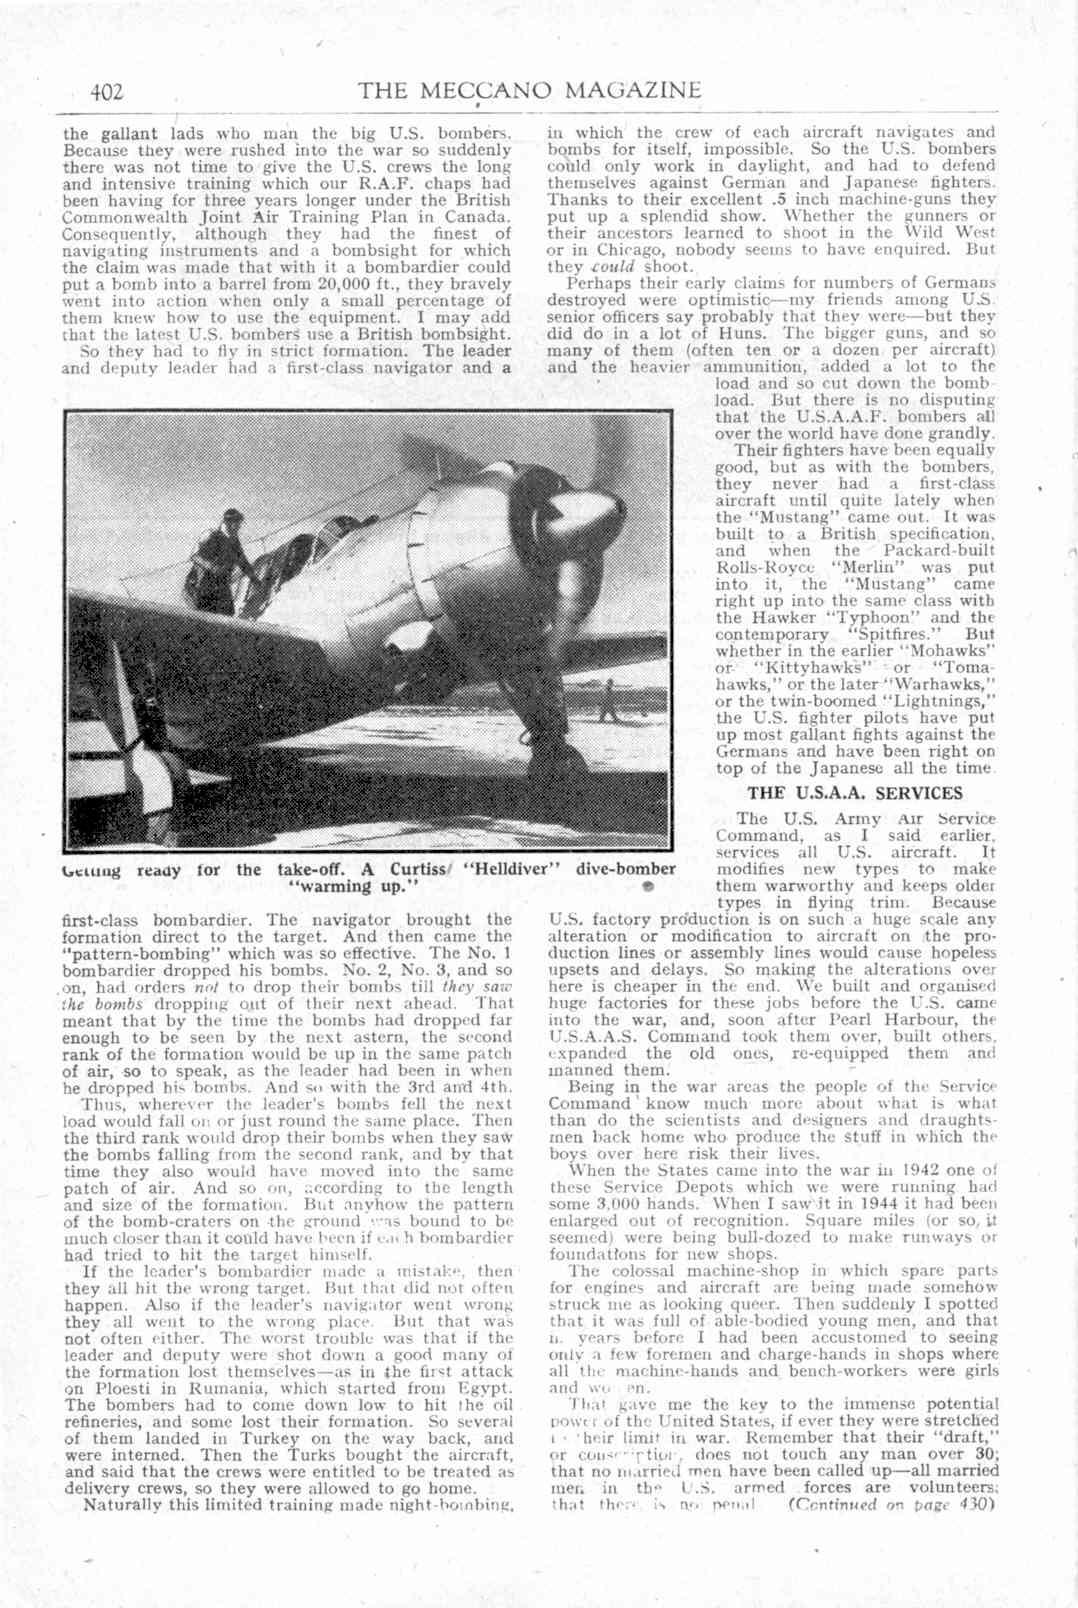 UK Meccano Magazine December 1944 Page 402